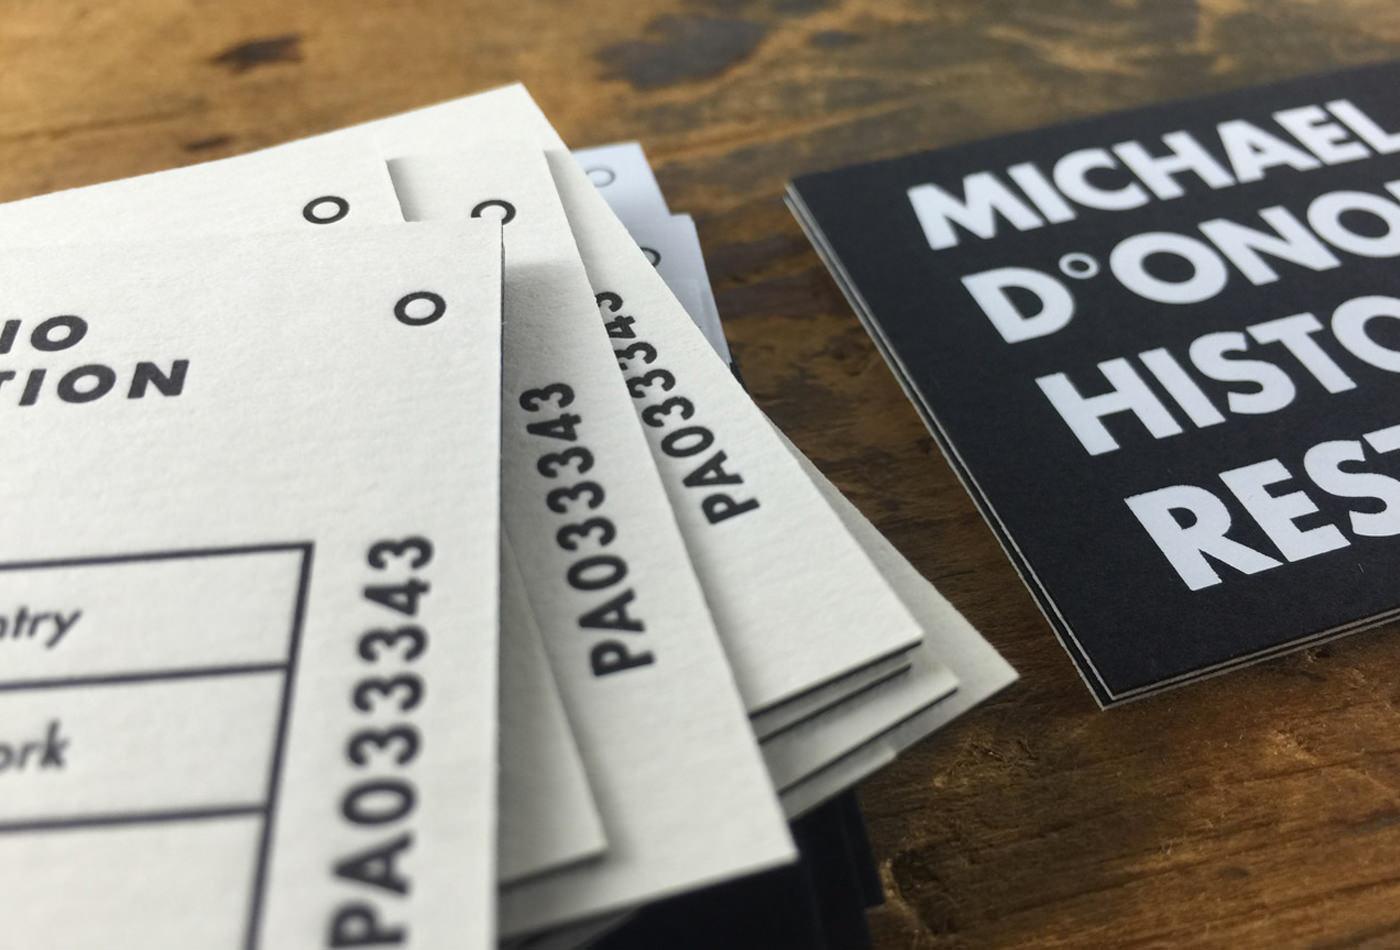 michael-donofrio-philadelphia-branding-vacaliebres-logos-identity